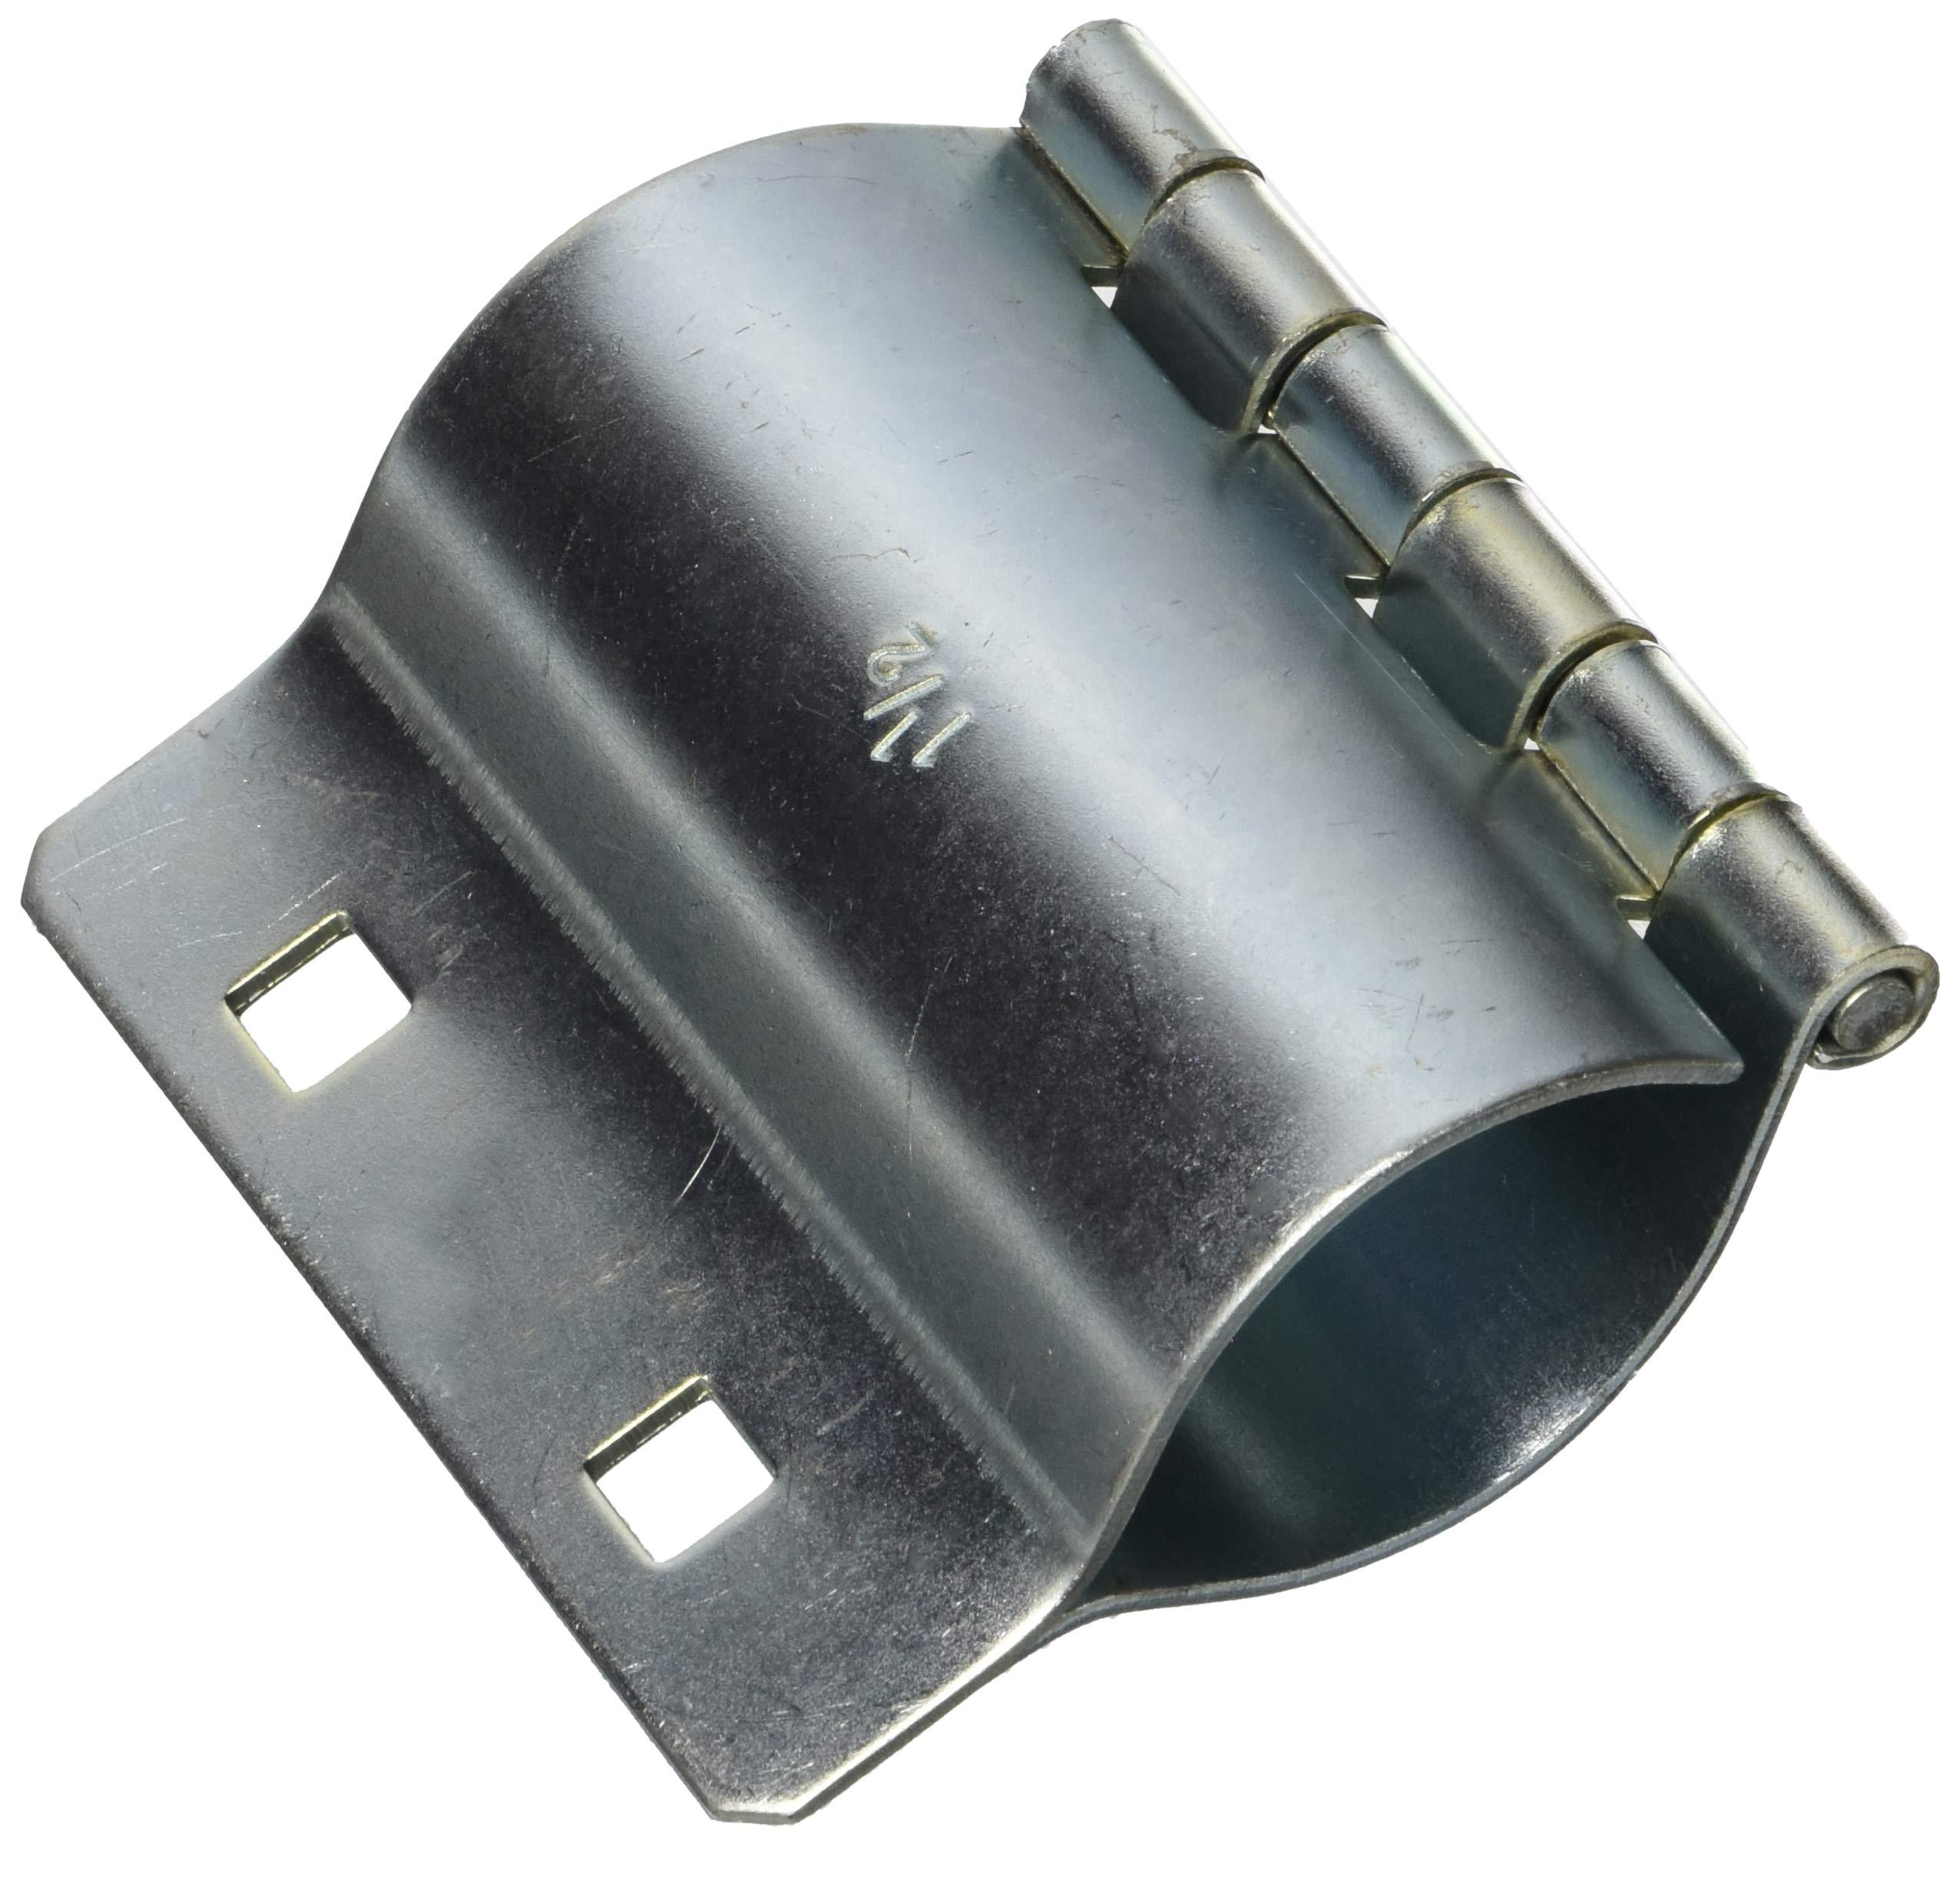 MUELLER B/&K 160-805 GALVANIZED 1 INCH PIPE REPAIR CLAMP NEW